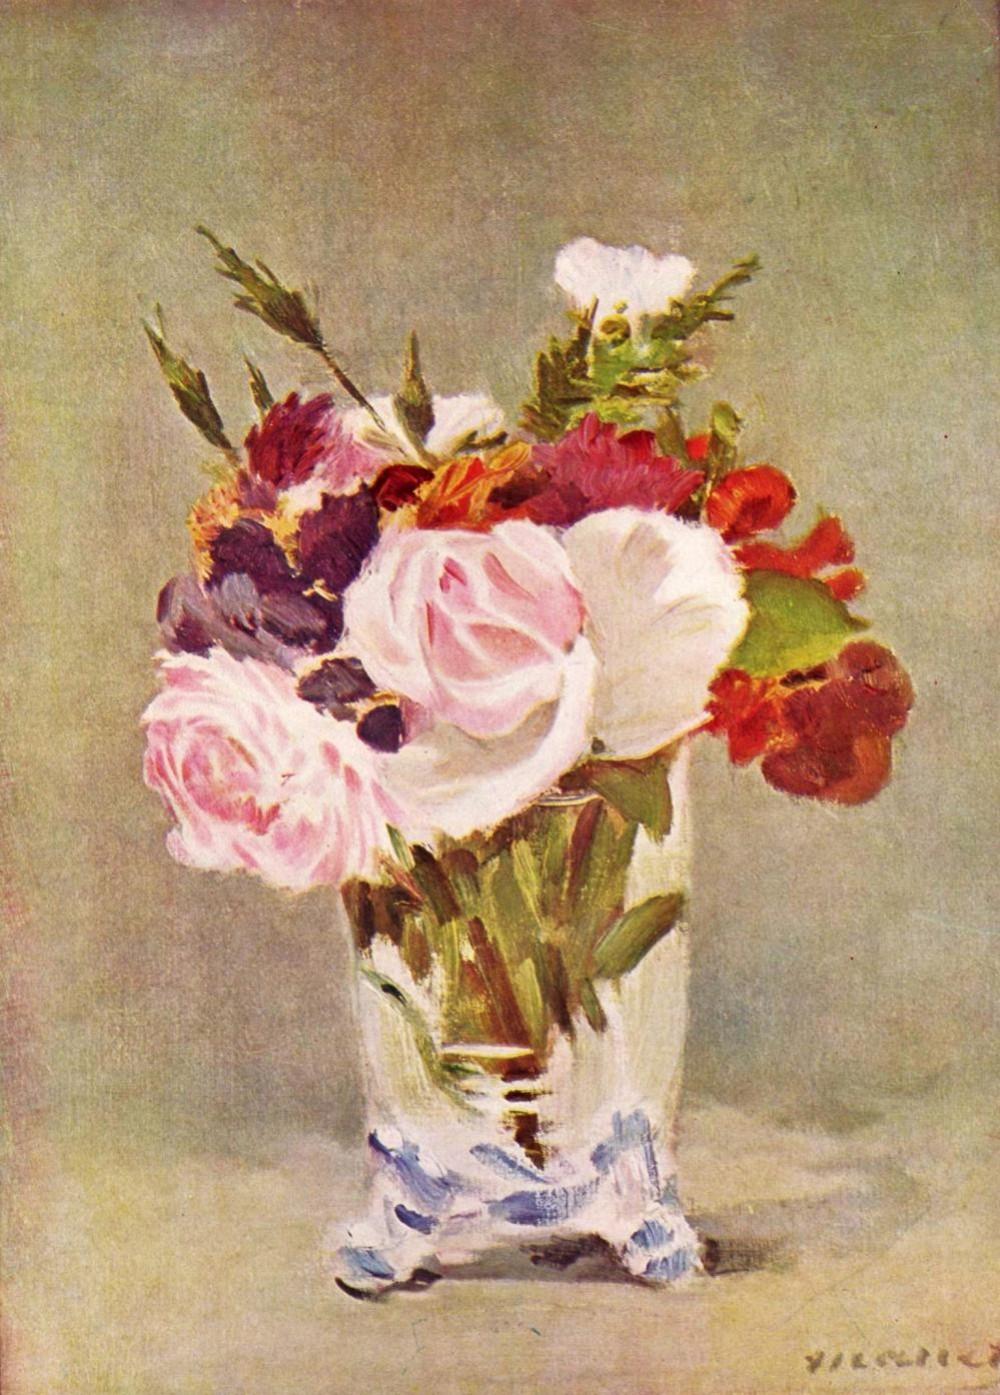 https://03varvara.files.wordpress.com/2010/07/edouard-manet-roses-carnartions-and-peonies-1880-e1280196018178.jpg?w=1000&h=1395